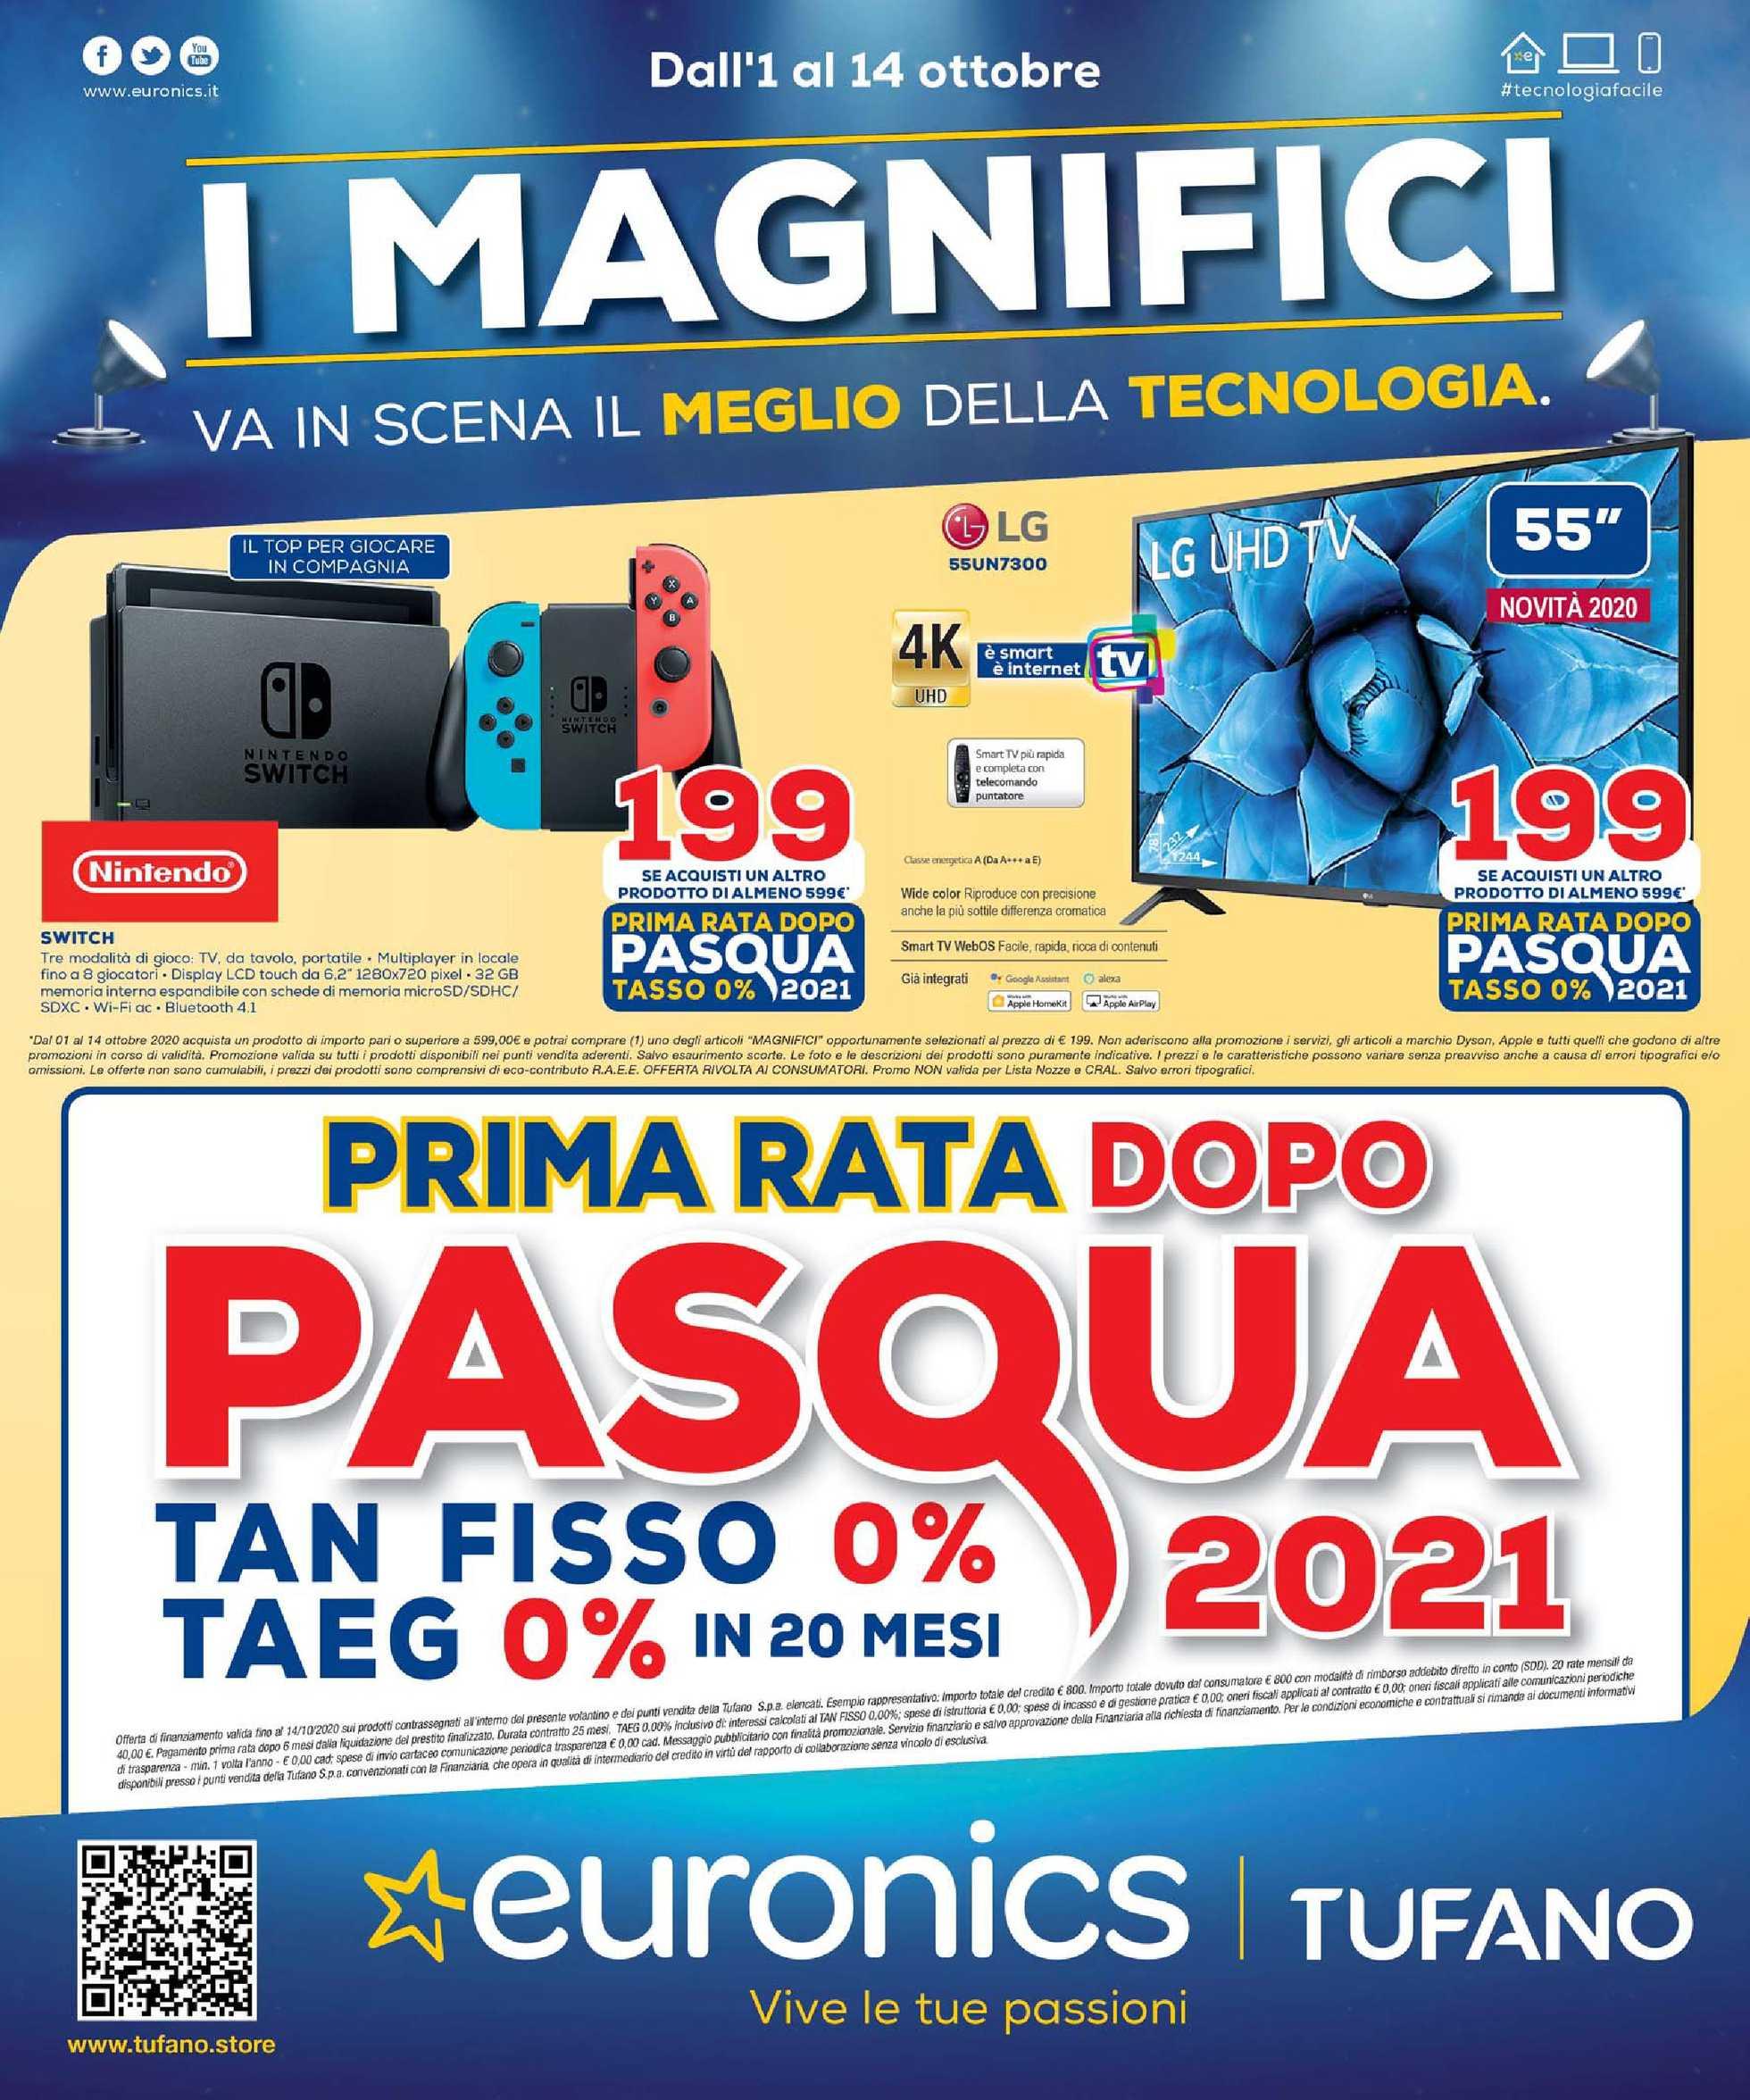 Euronics Bruno - offerte valide dal 01.10.2020 al 14.10.2020 - pagina 1.